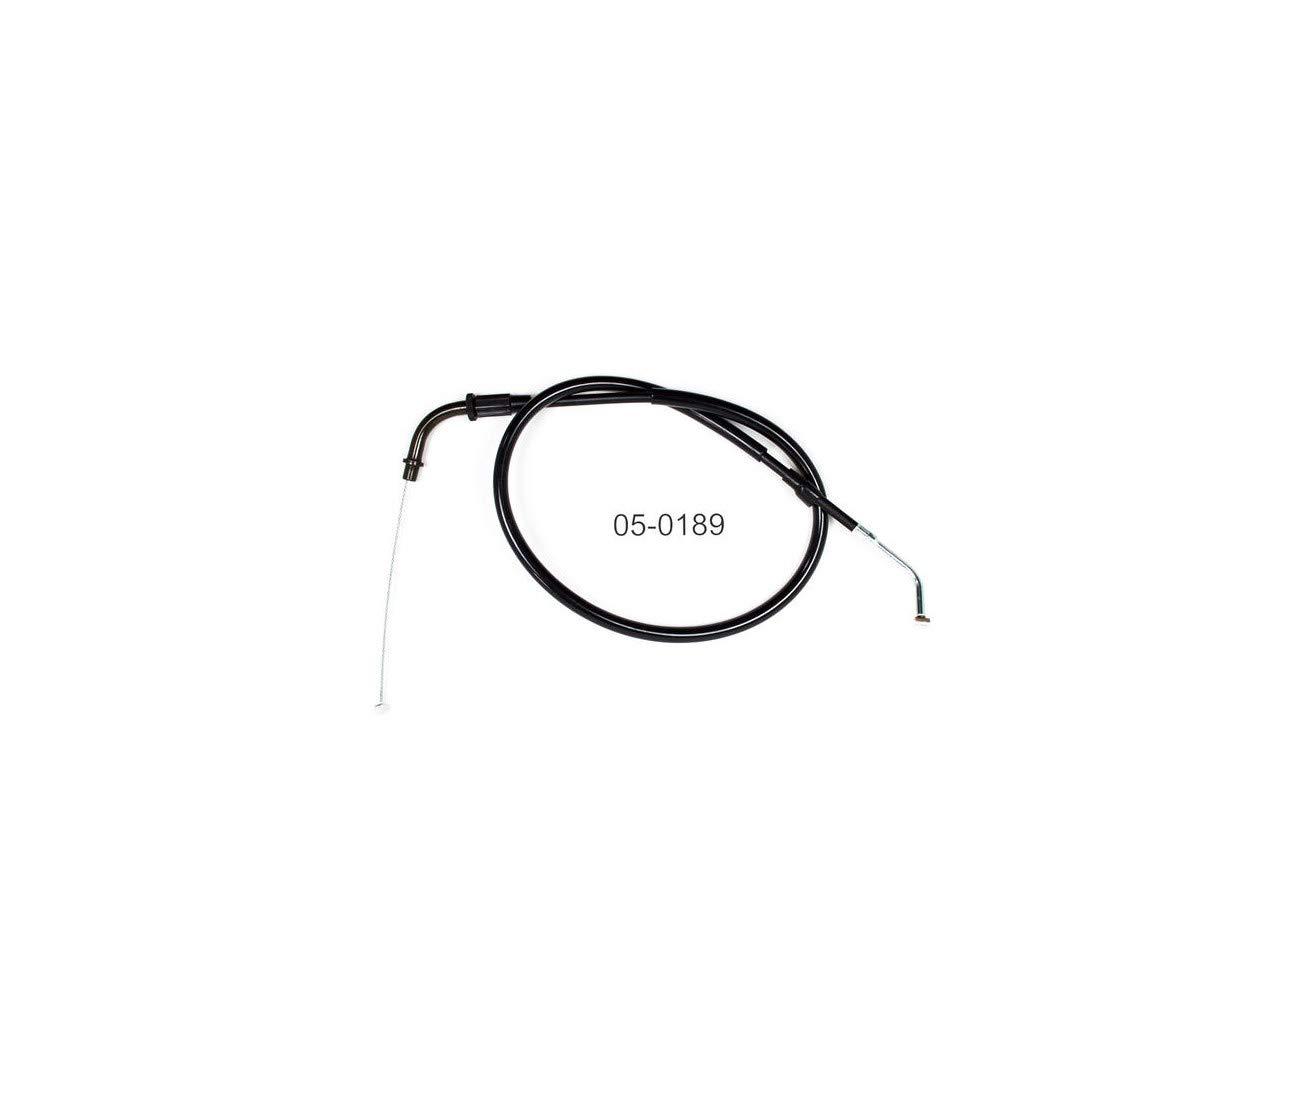 CABLE ACCELERATEUR NEUF-884189 YAMAHA XV 535 VIRAGO-1987//93